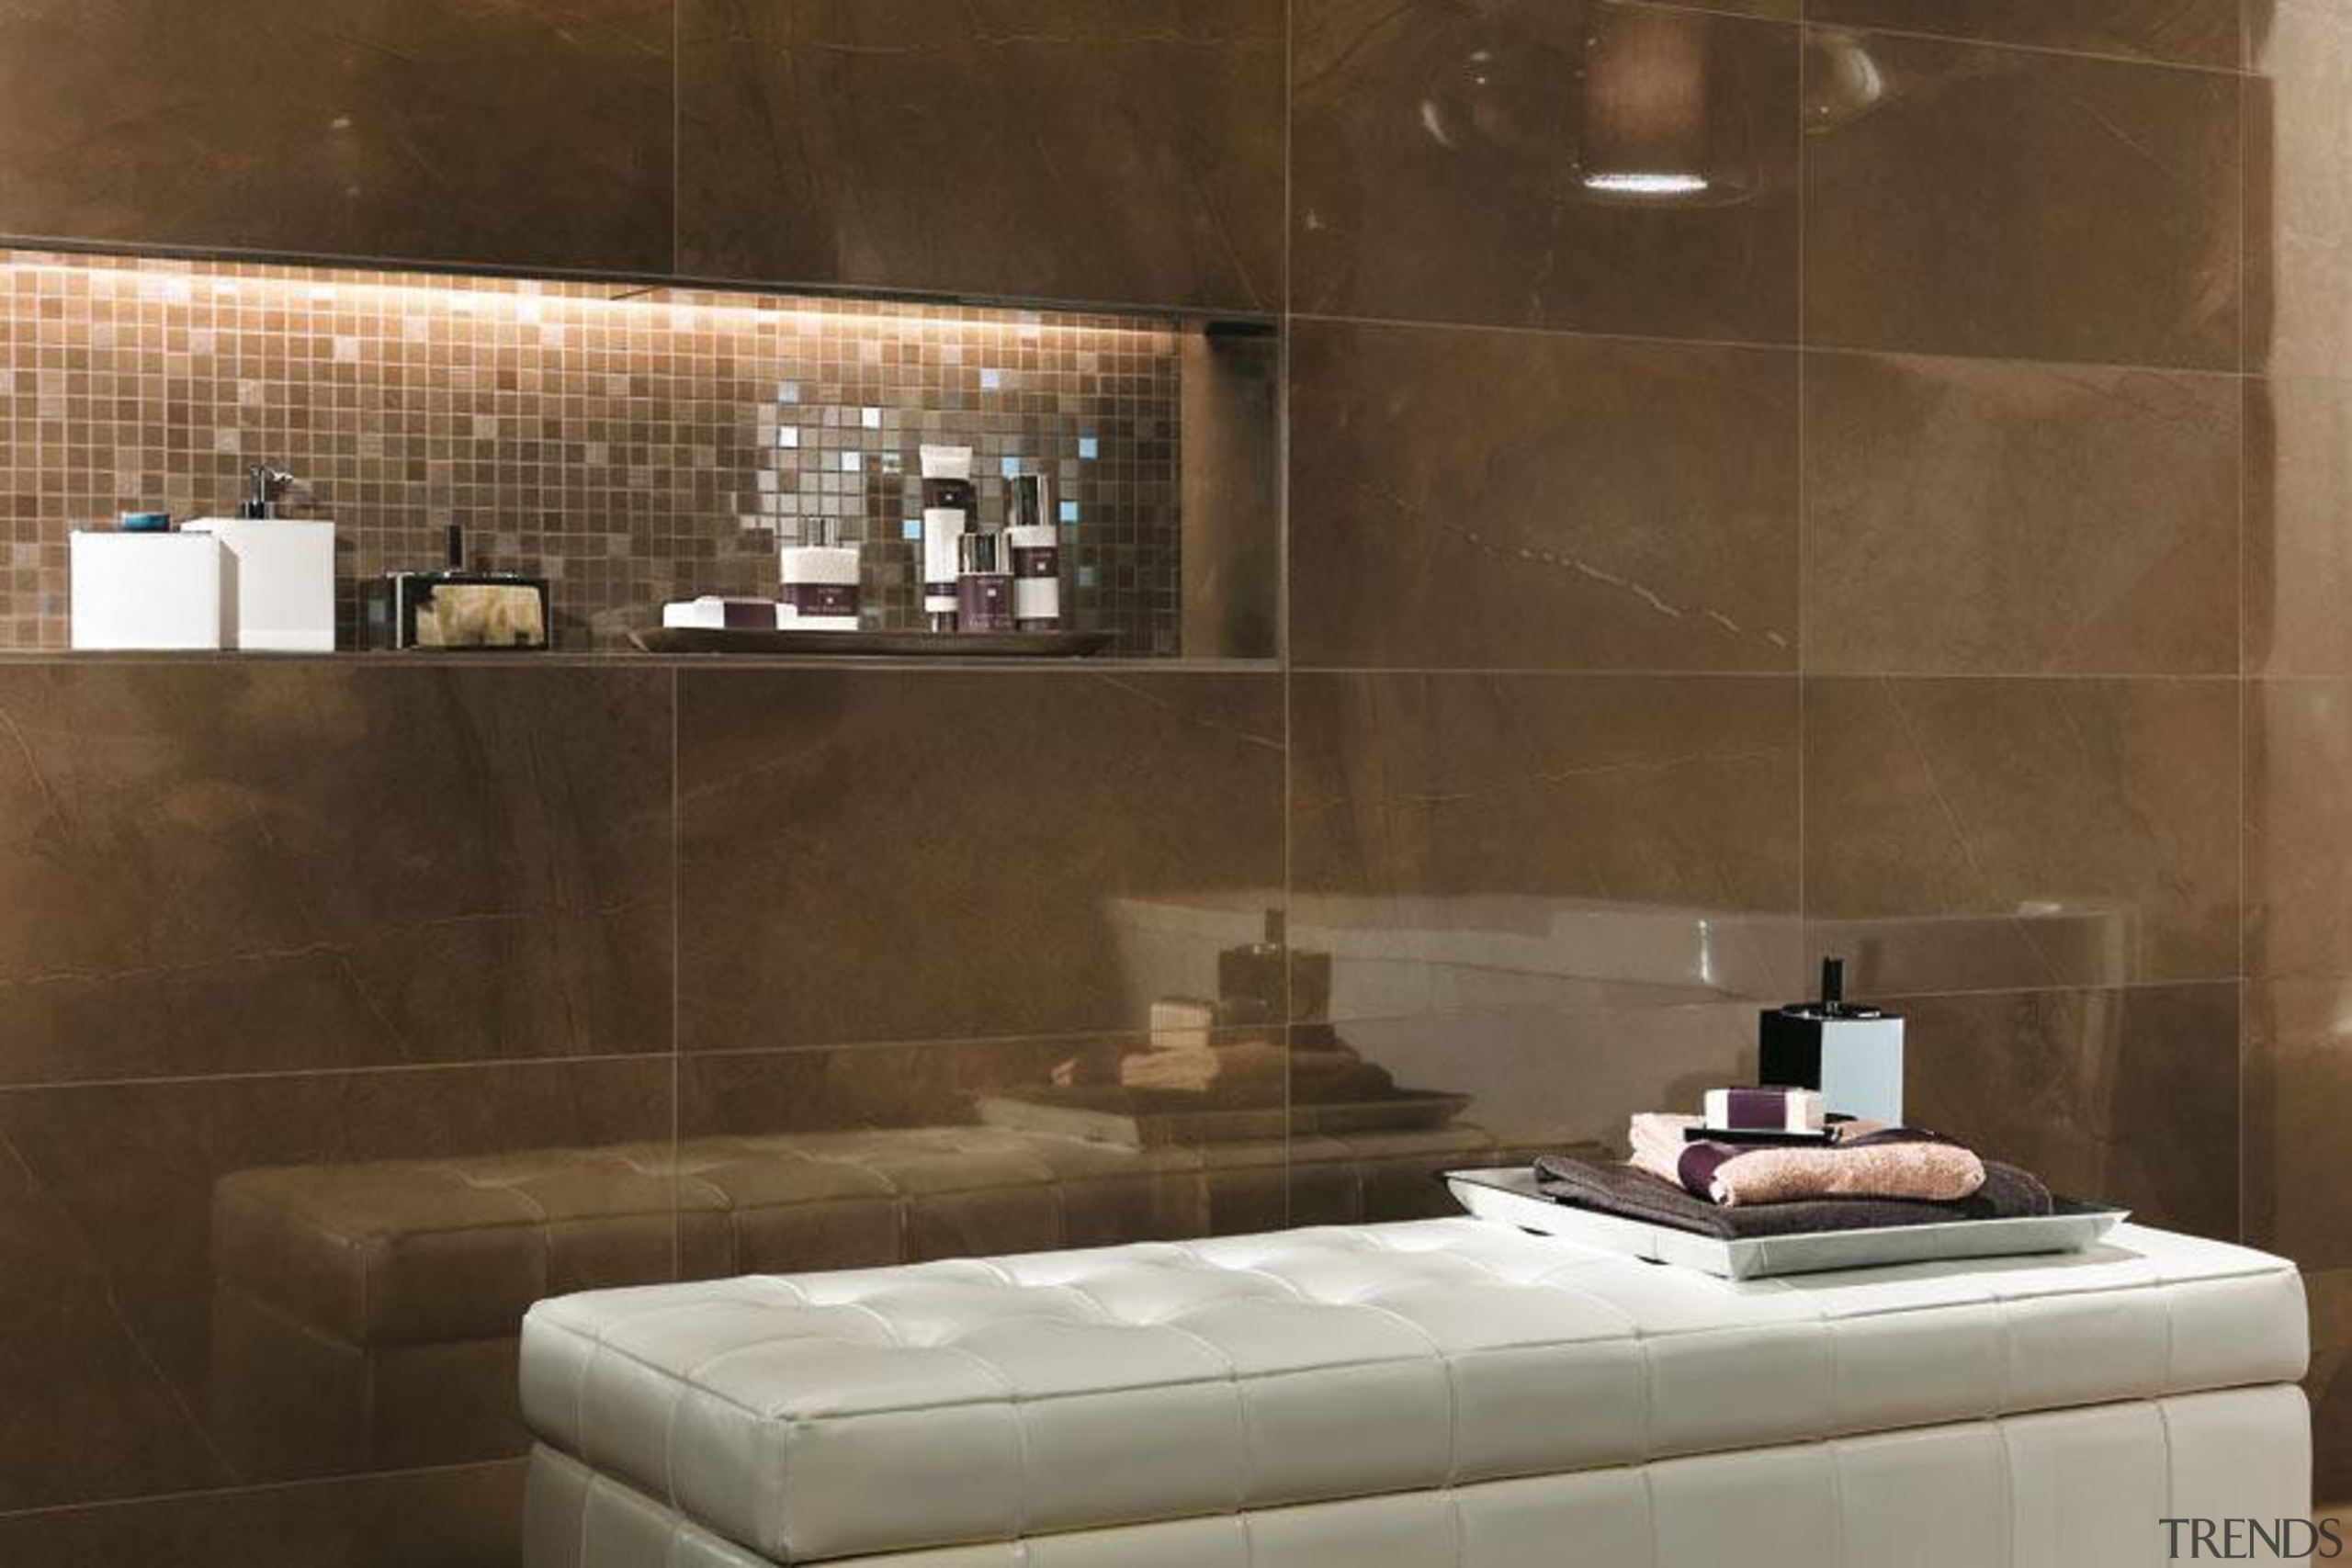 Marvel bronze bathroom wall tiles - Cb 7461375050036187 bathroom, floor, flooring, interior design, tile, wall, brown